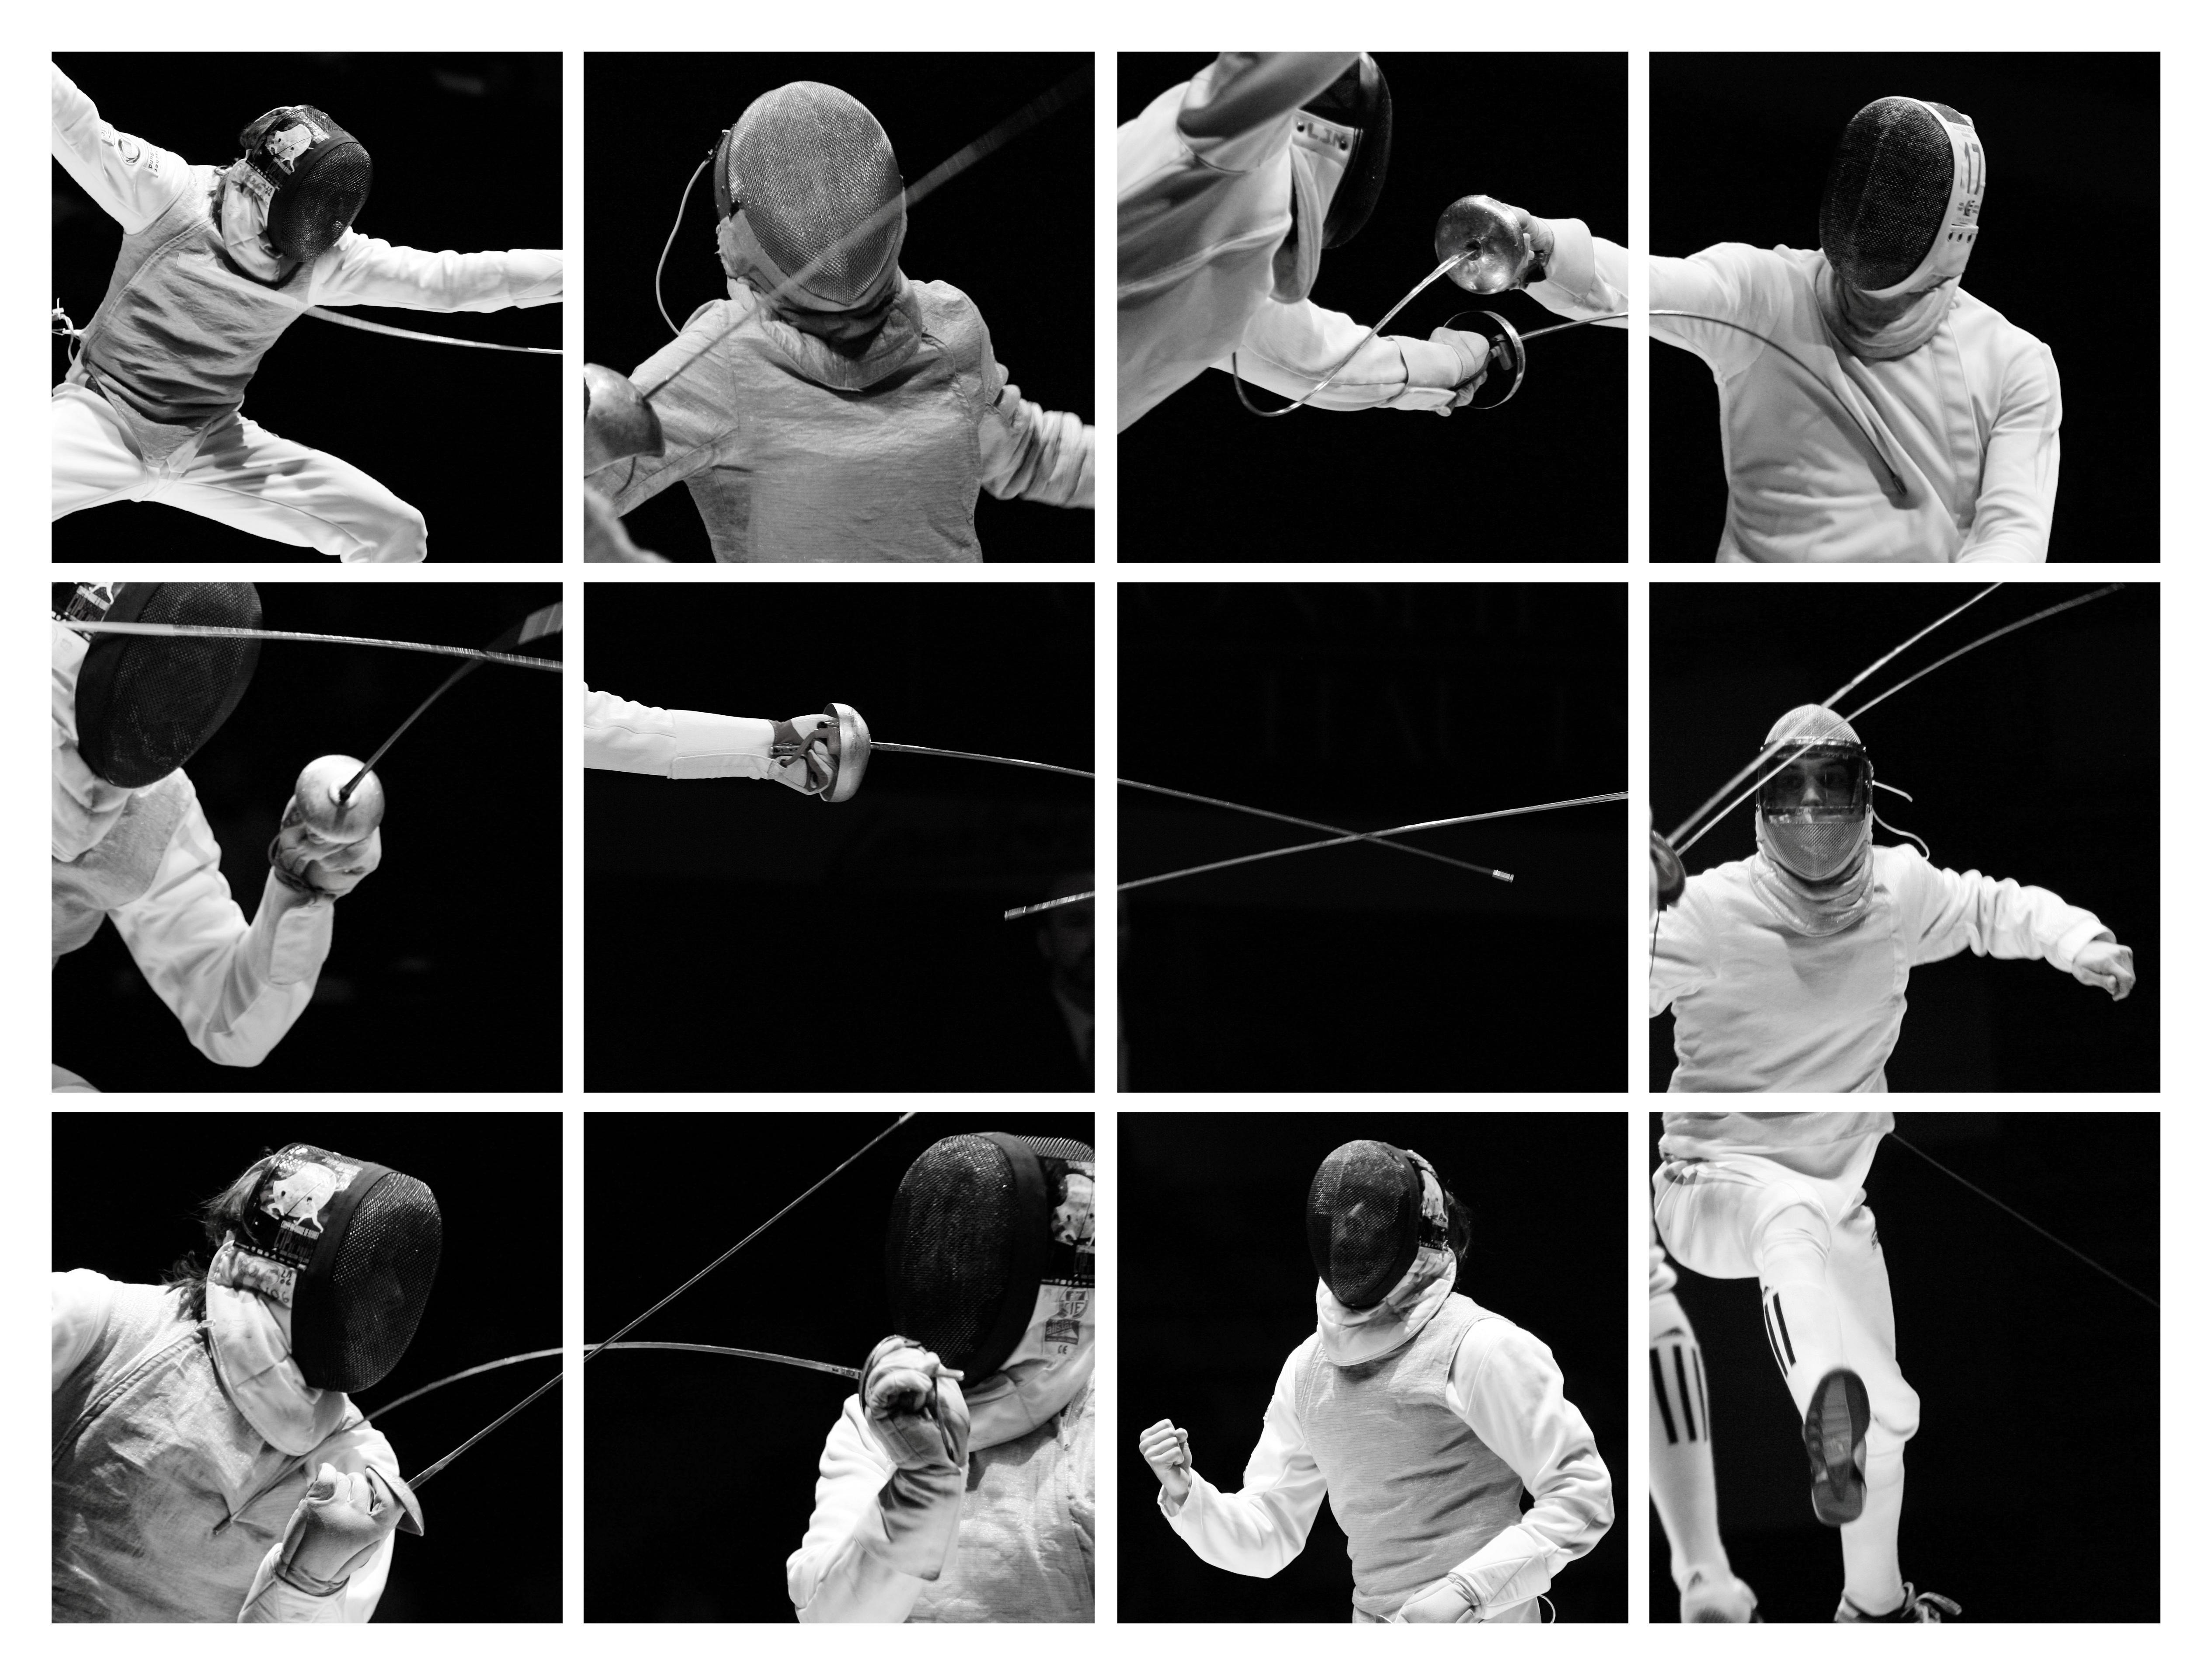 fencing11.jpeg